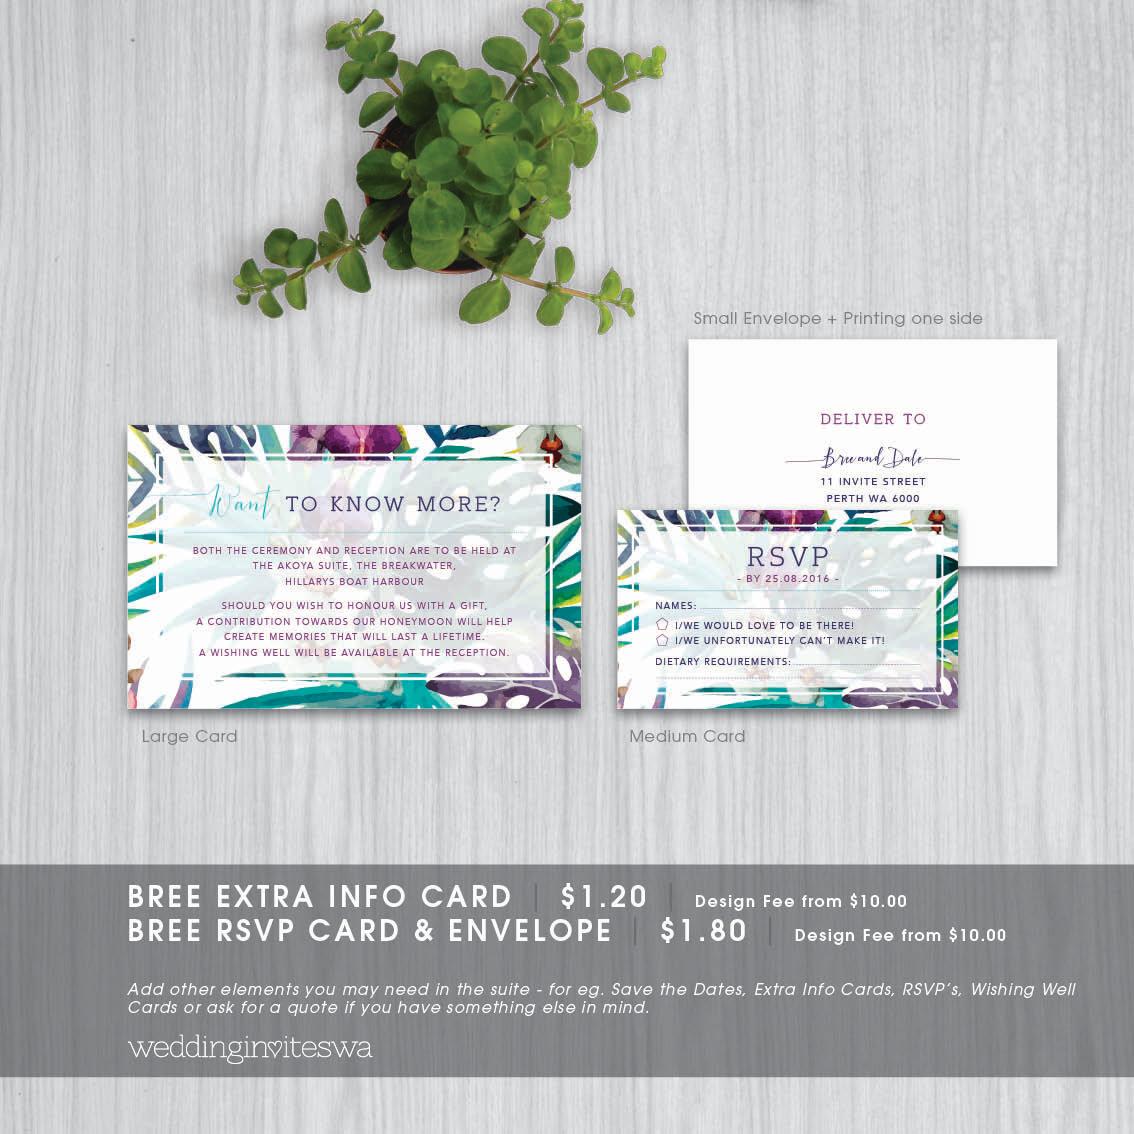 BREE_extra cards